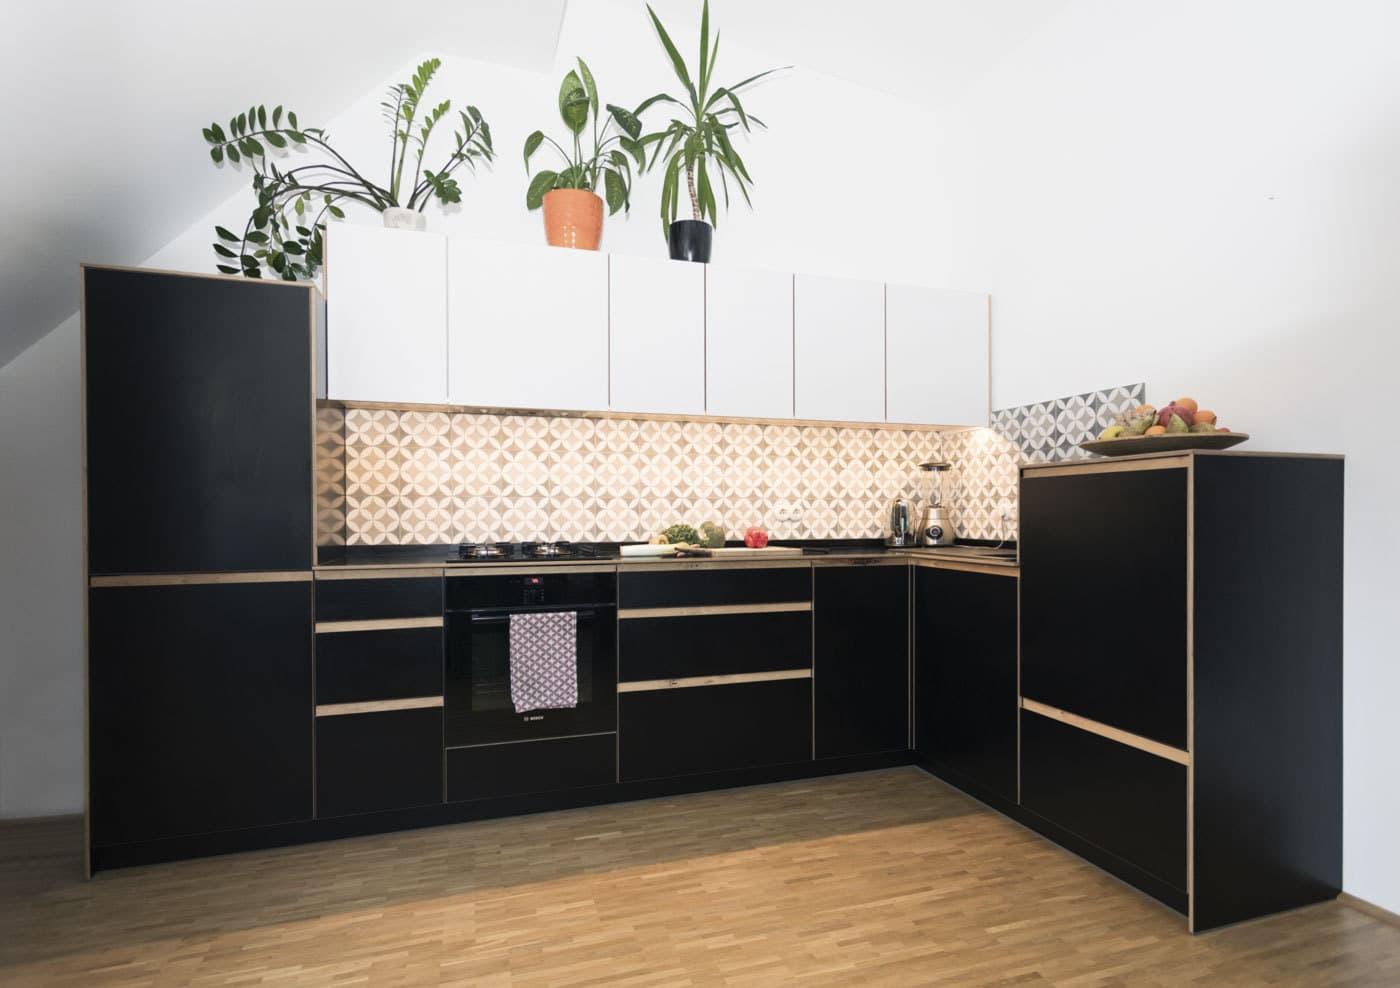 nachhaltiges interior design salzburg kueche papillon